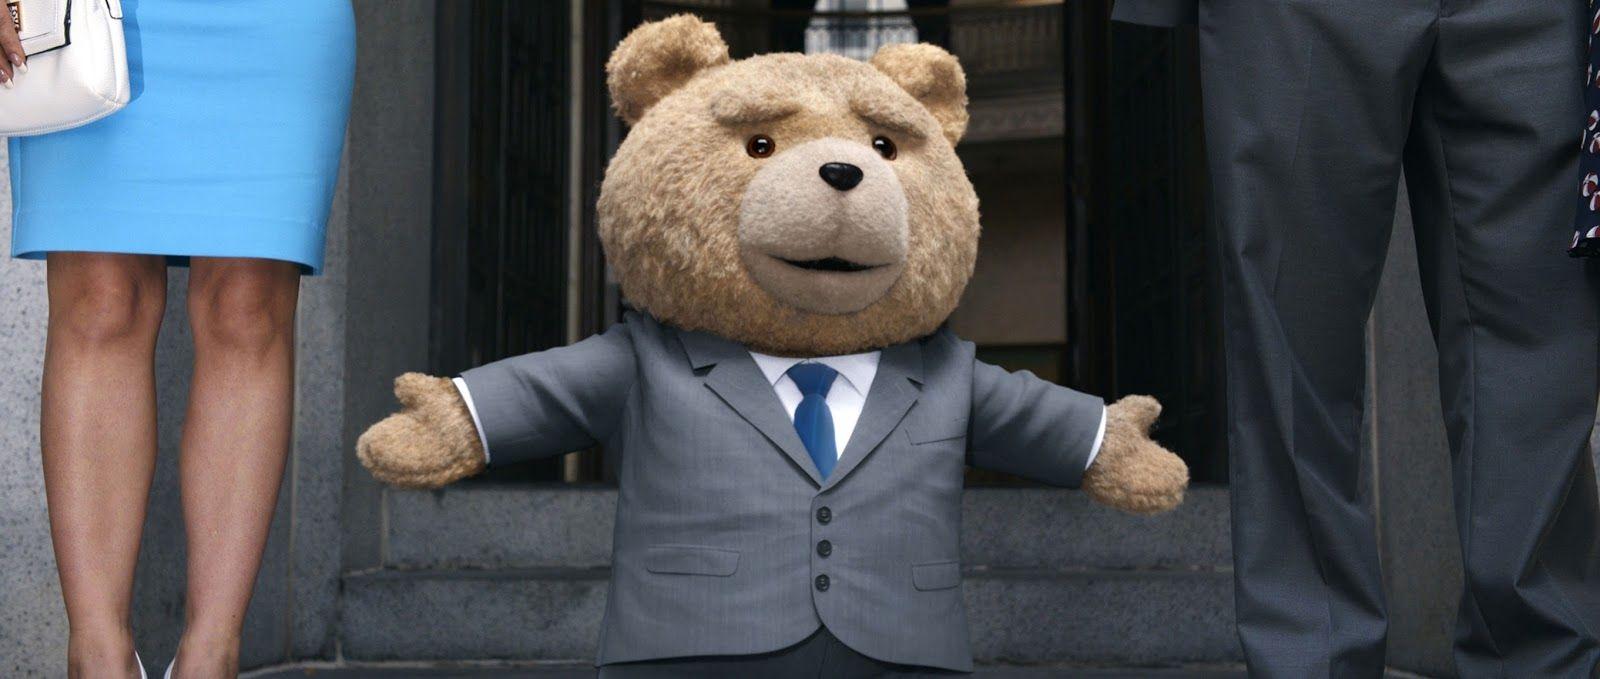 Ted 2 Movie Image 1